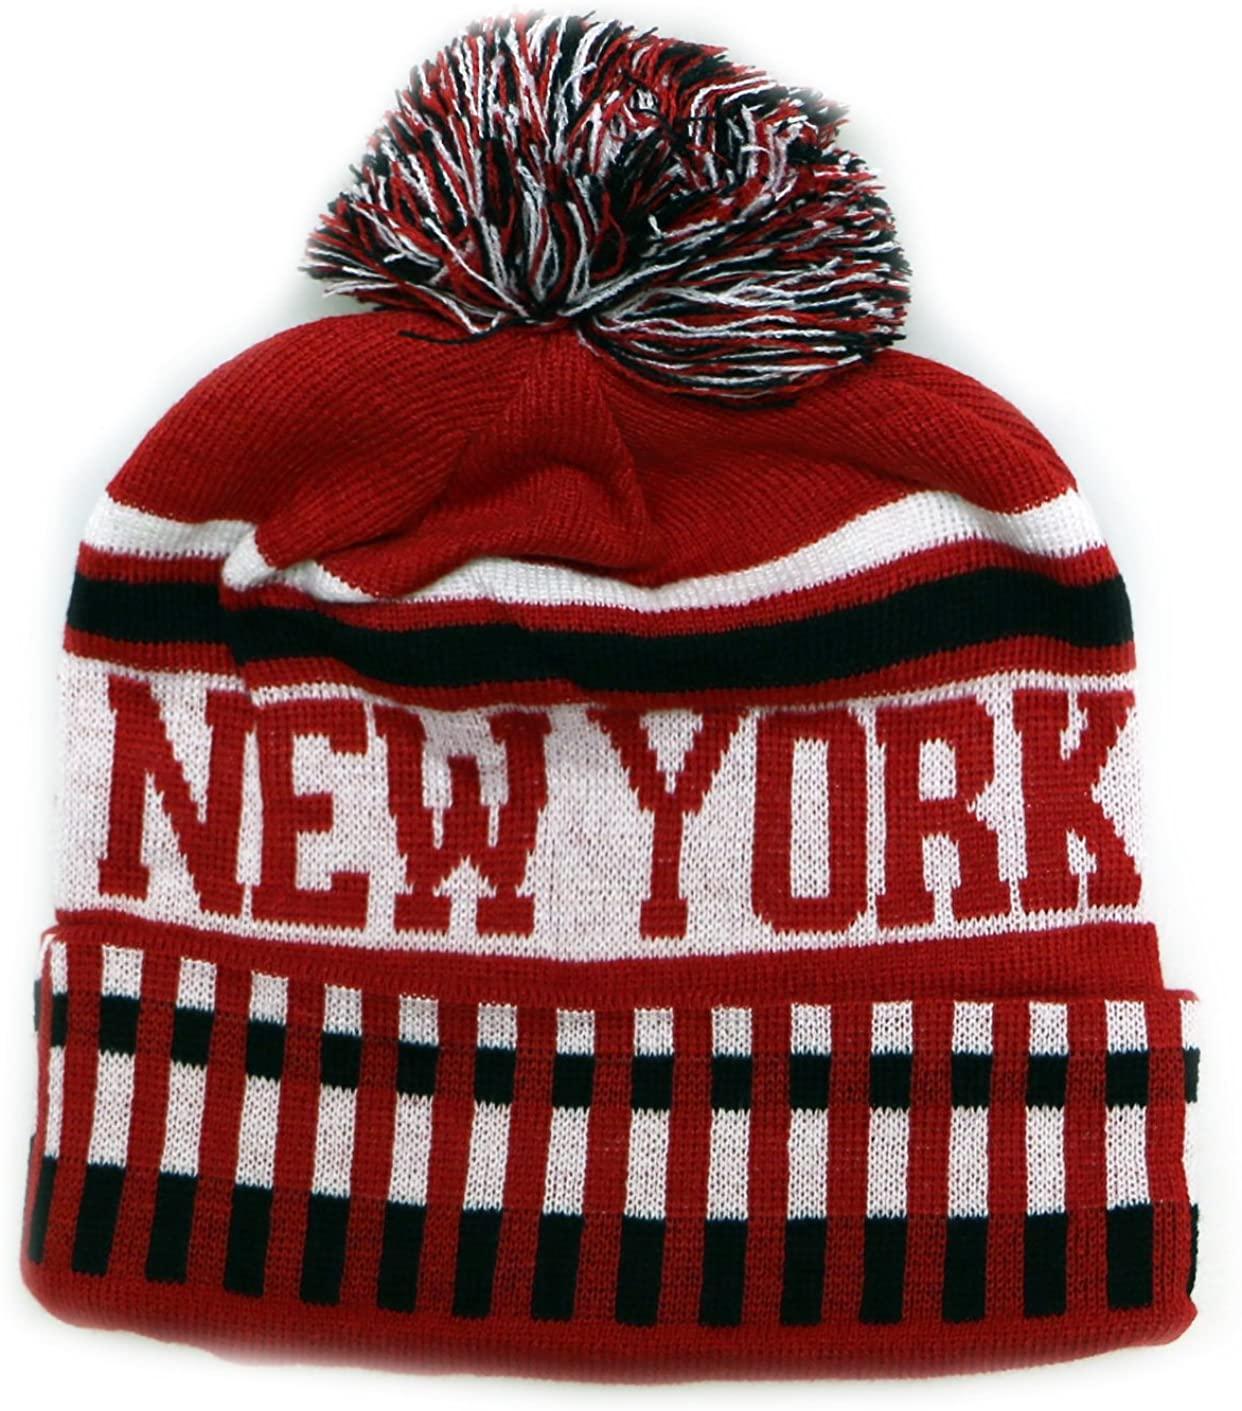 City Hunter Sk1120 New York Vertical Pattern Pom Pom Beanie Hat - Red/black